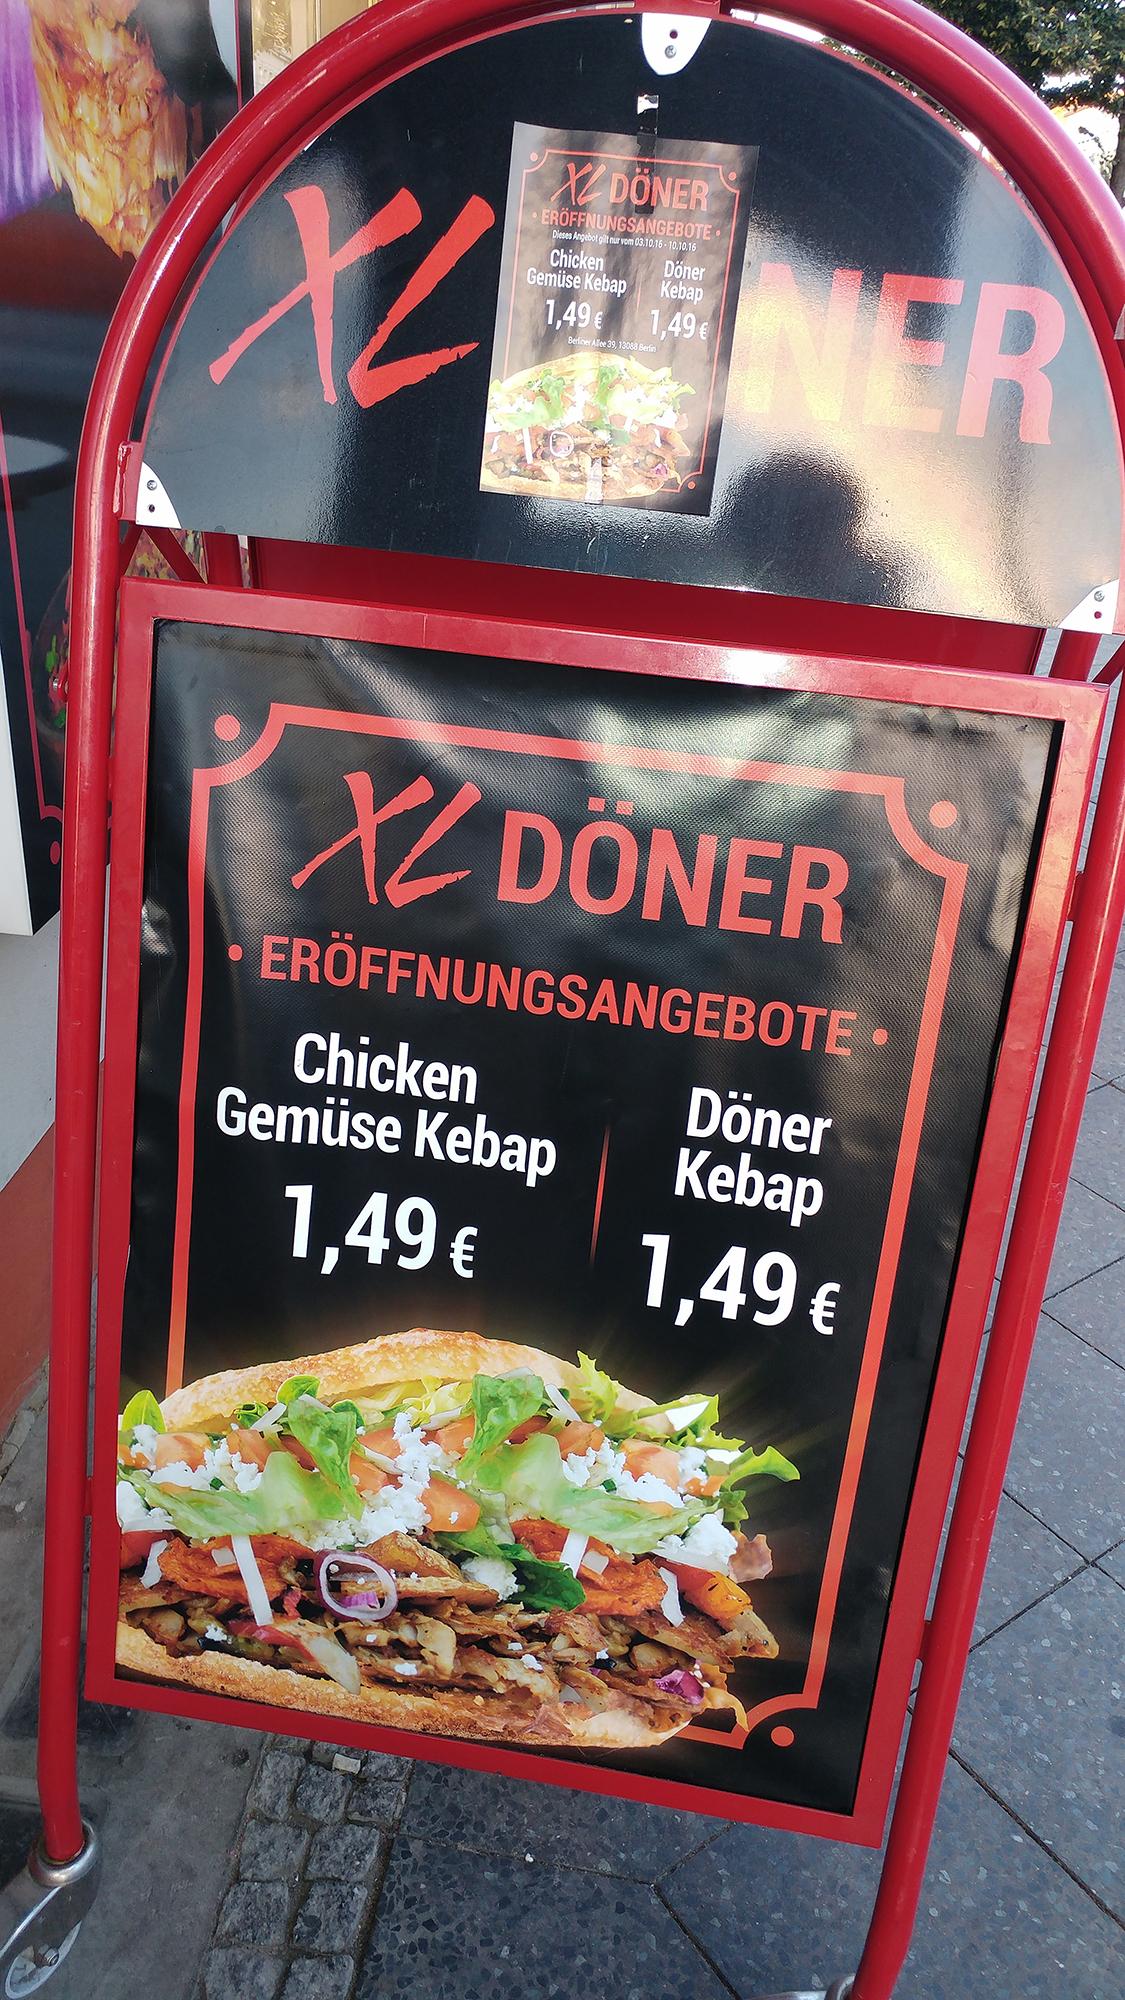 [Lokal Berlin] Döner am Antonplatz für 1,49 EUR